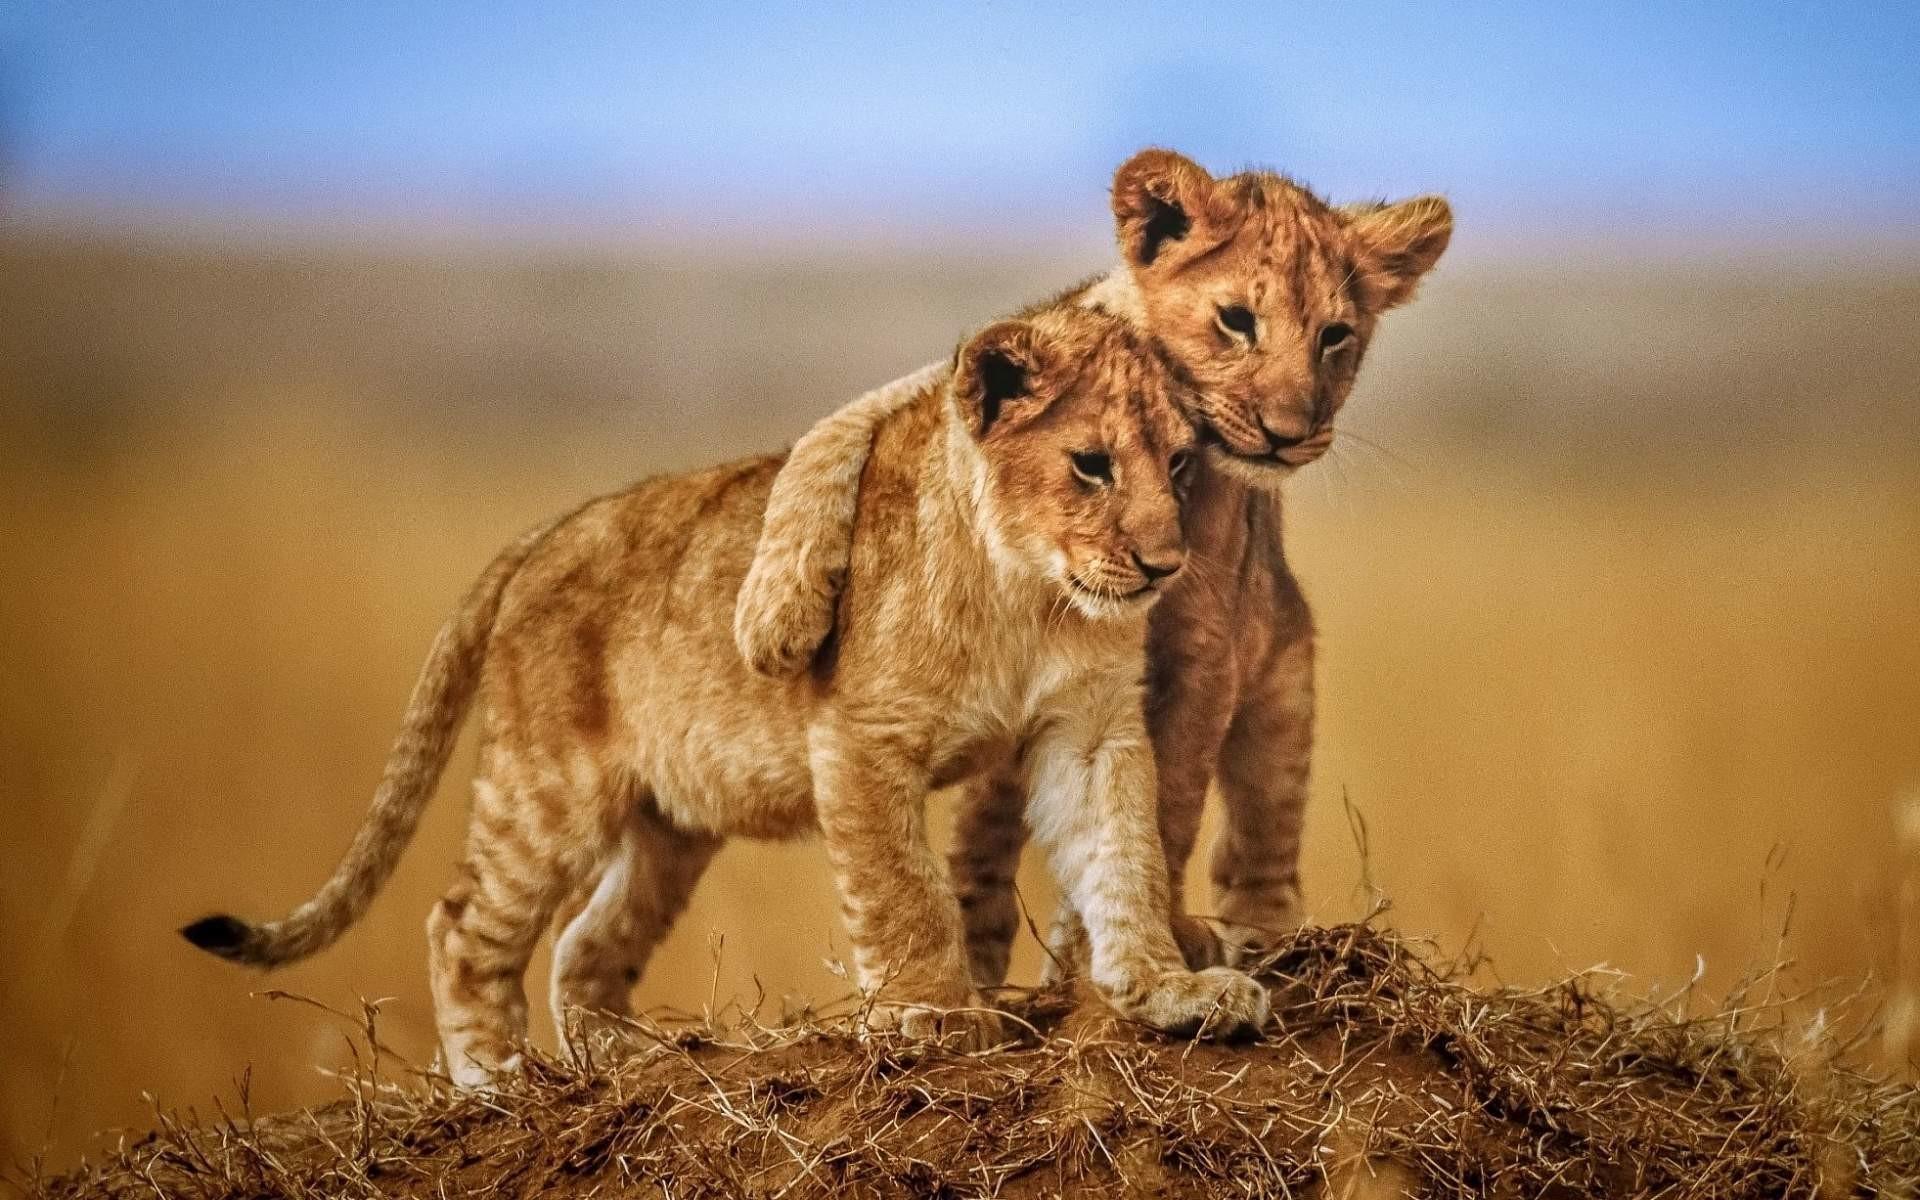 10 Top Cute Wild Animal Wallpaper Full Hd 1080p For Pc: Lion Wallpaper Desktop (68+ Images